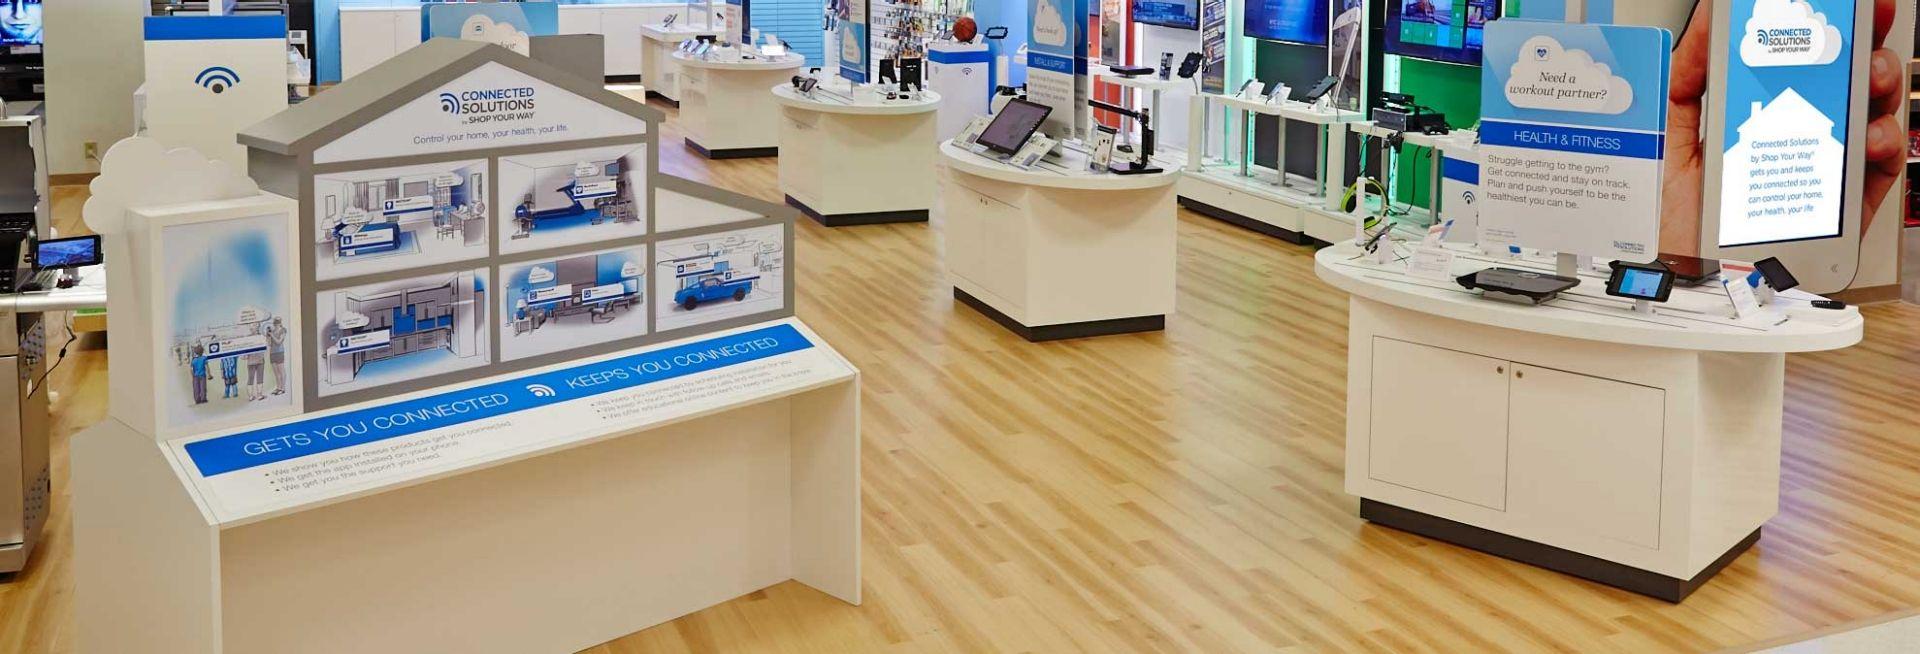 Sears Ramps Up Its Smart Home Line Smart home, Home